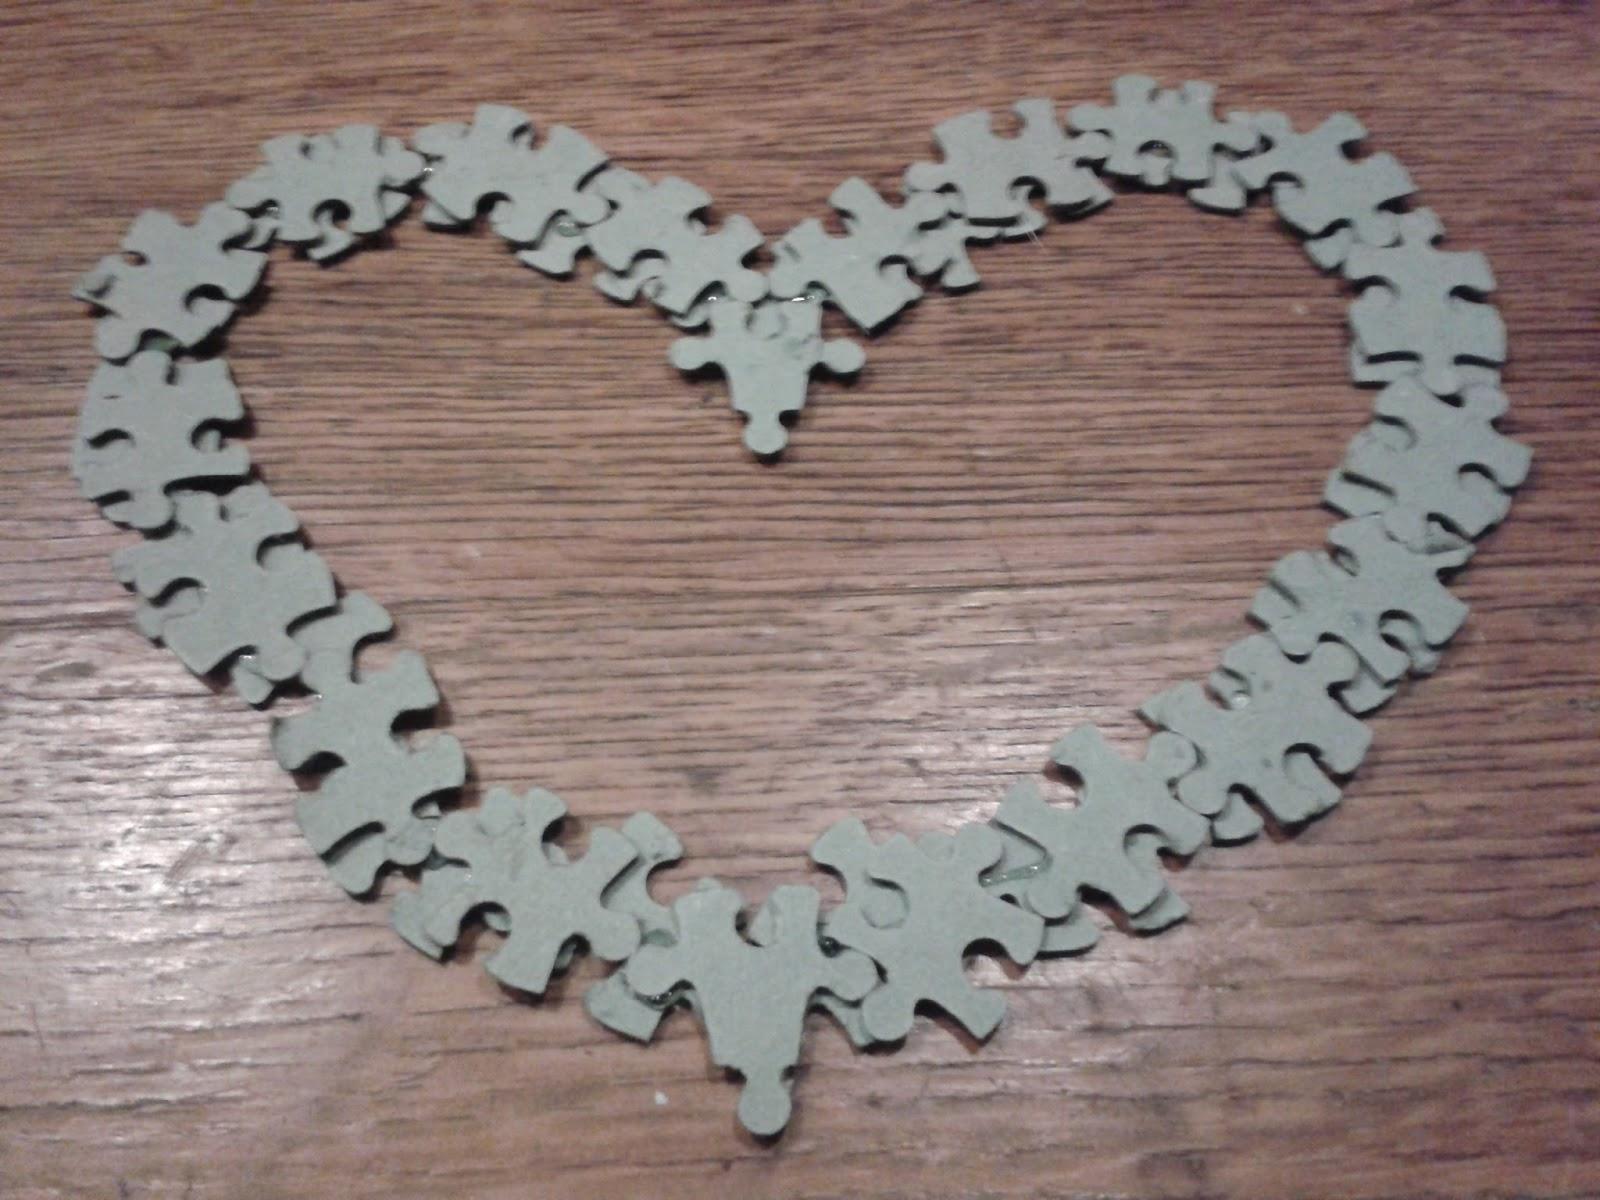 2014 03 18+20.19.46 - Hartje van puzzels